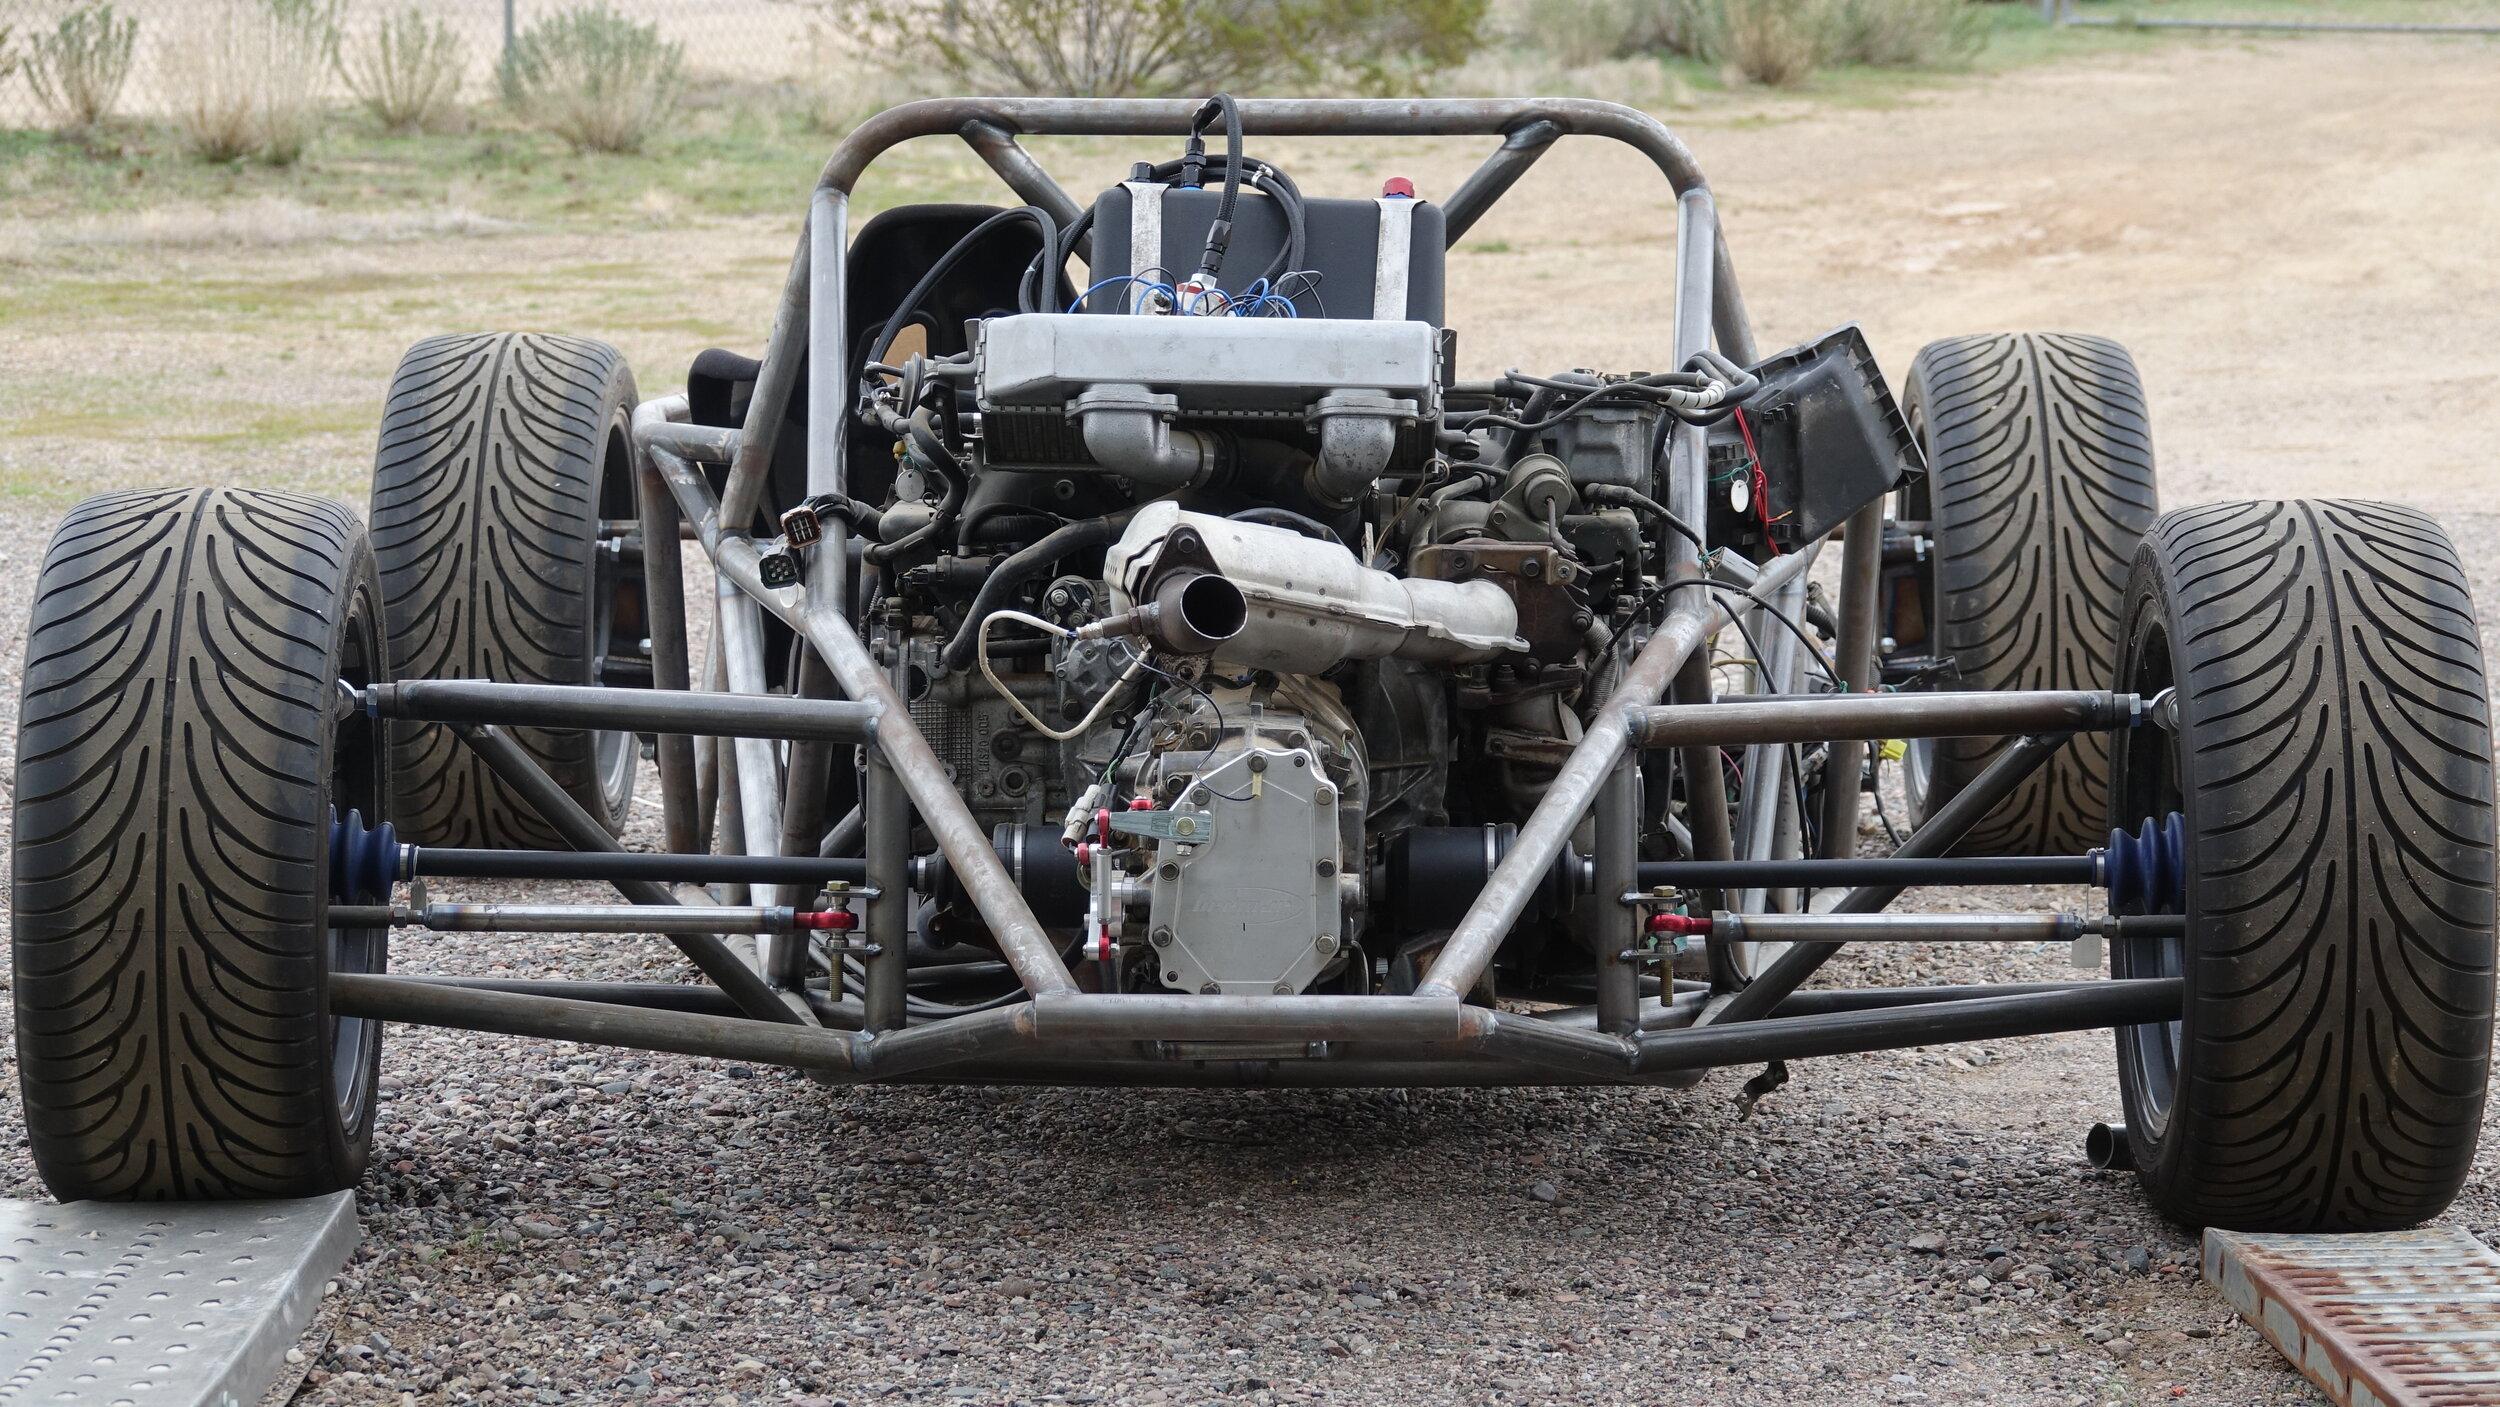 Subaru Race Kit Car Fully Custom Chassis And Body Work Centurial Inc